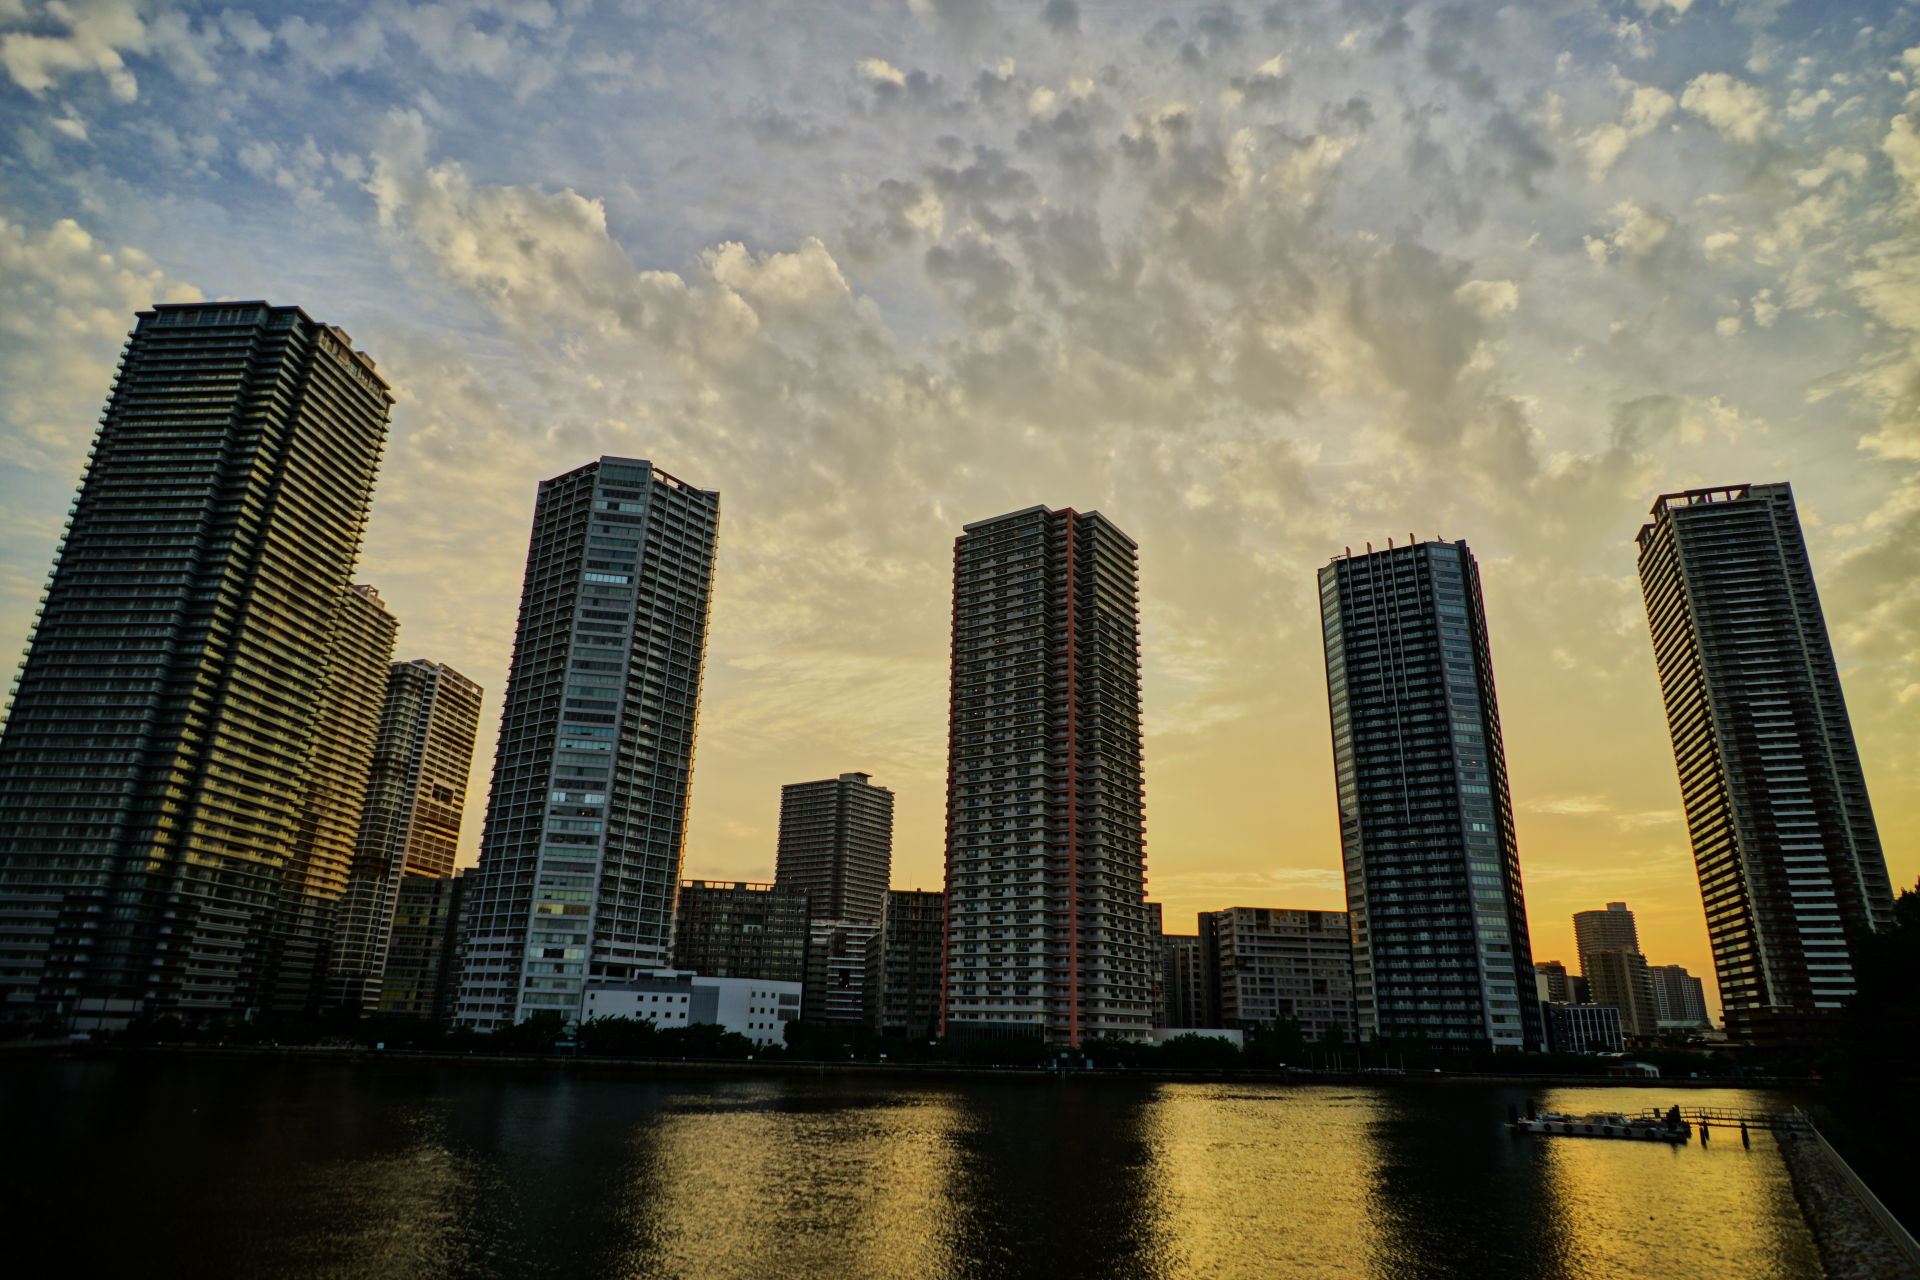 Shinonome Canal Sunset  (東雲運河サンセット)